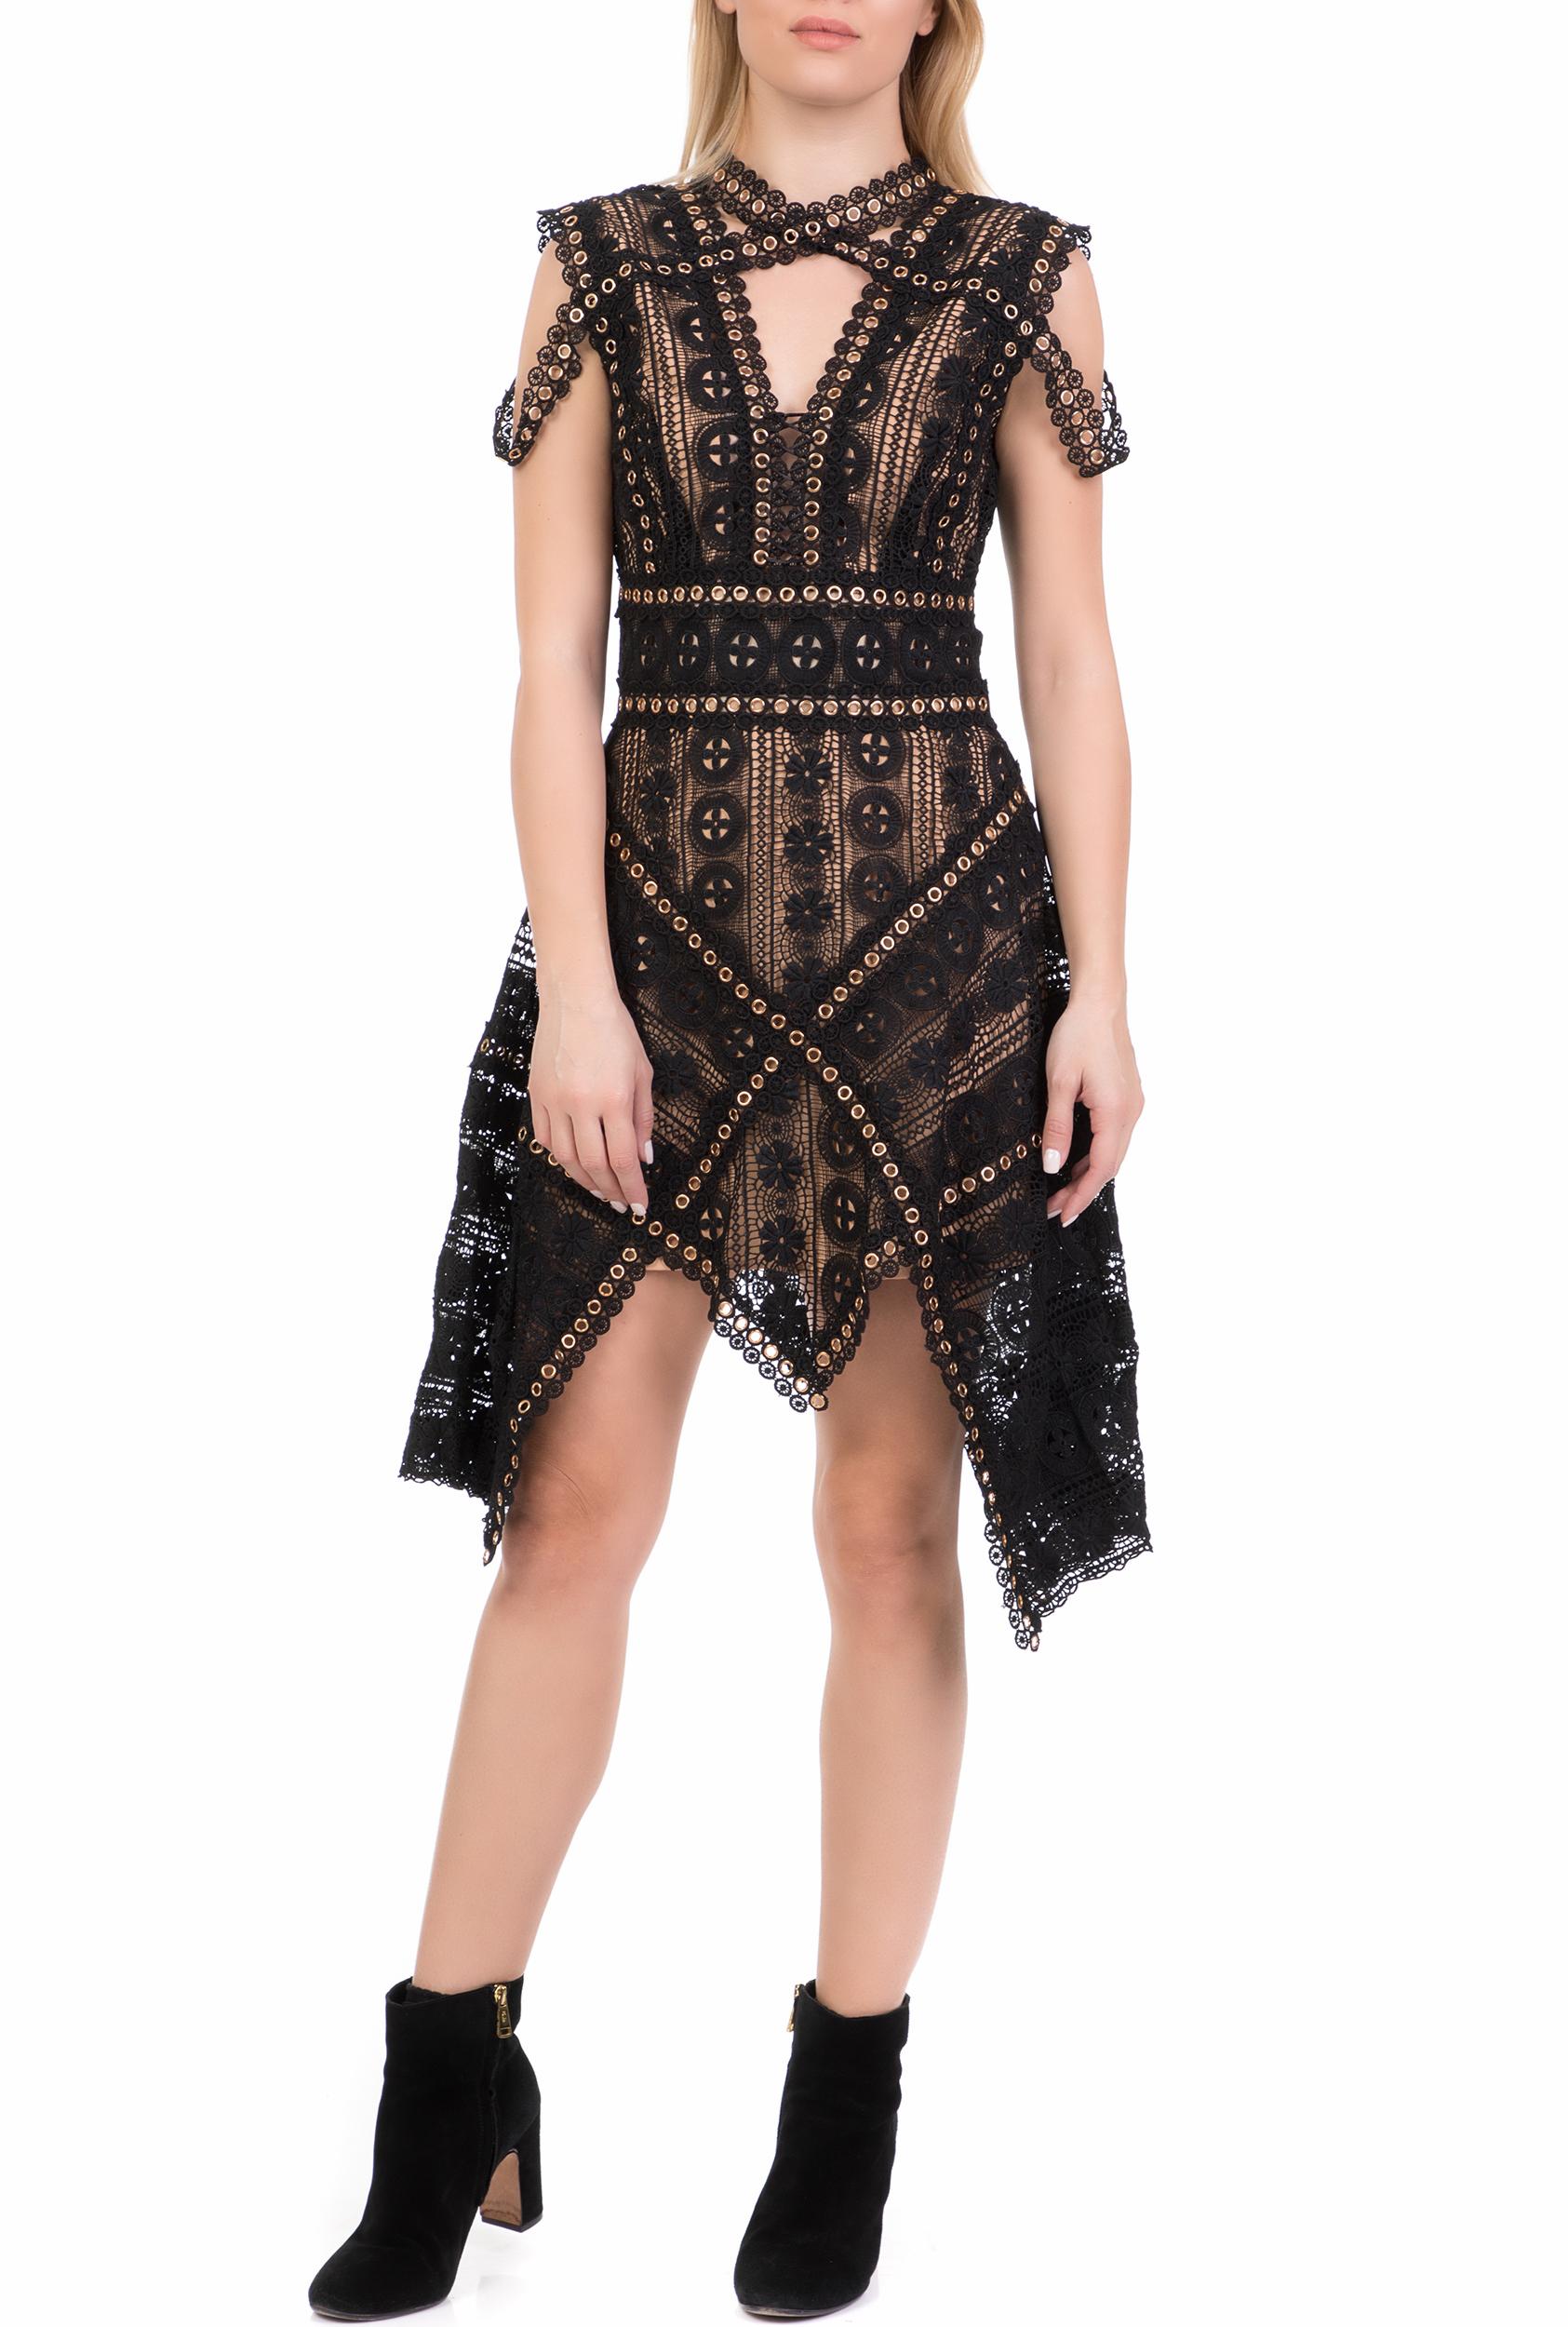 AMUSE - Γυναικείο μίνι φόρεμα AMUSE μαύρο γυναικεία ρούχα φόρεματα μίνι